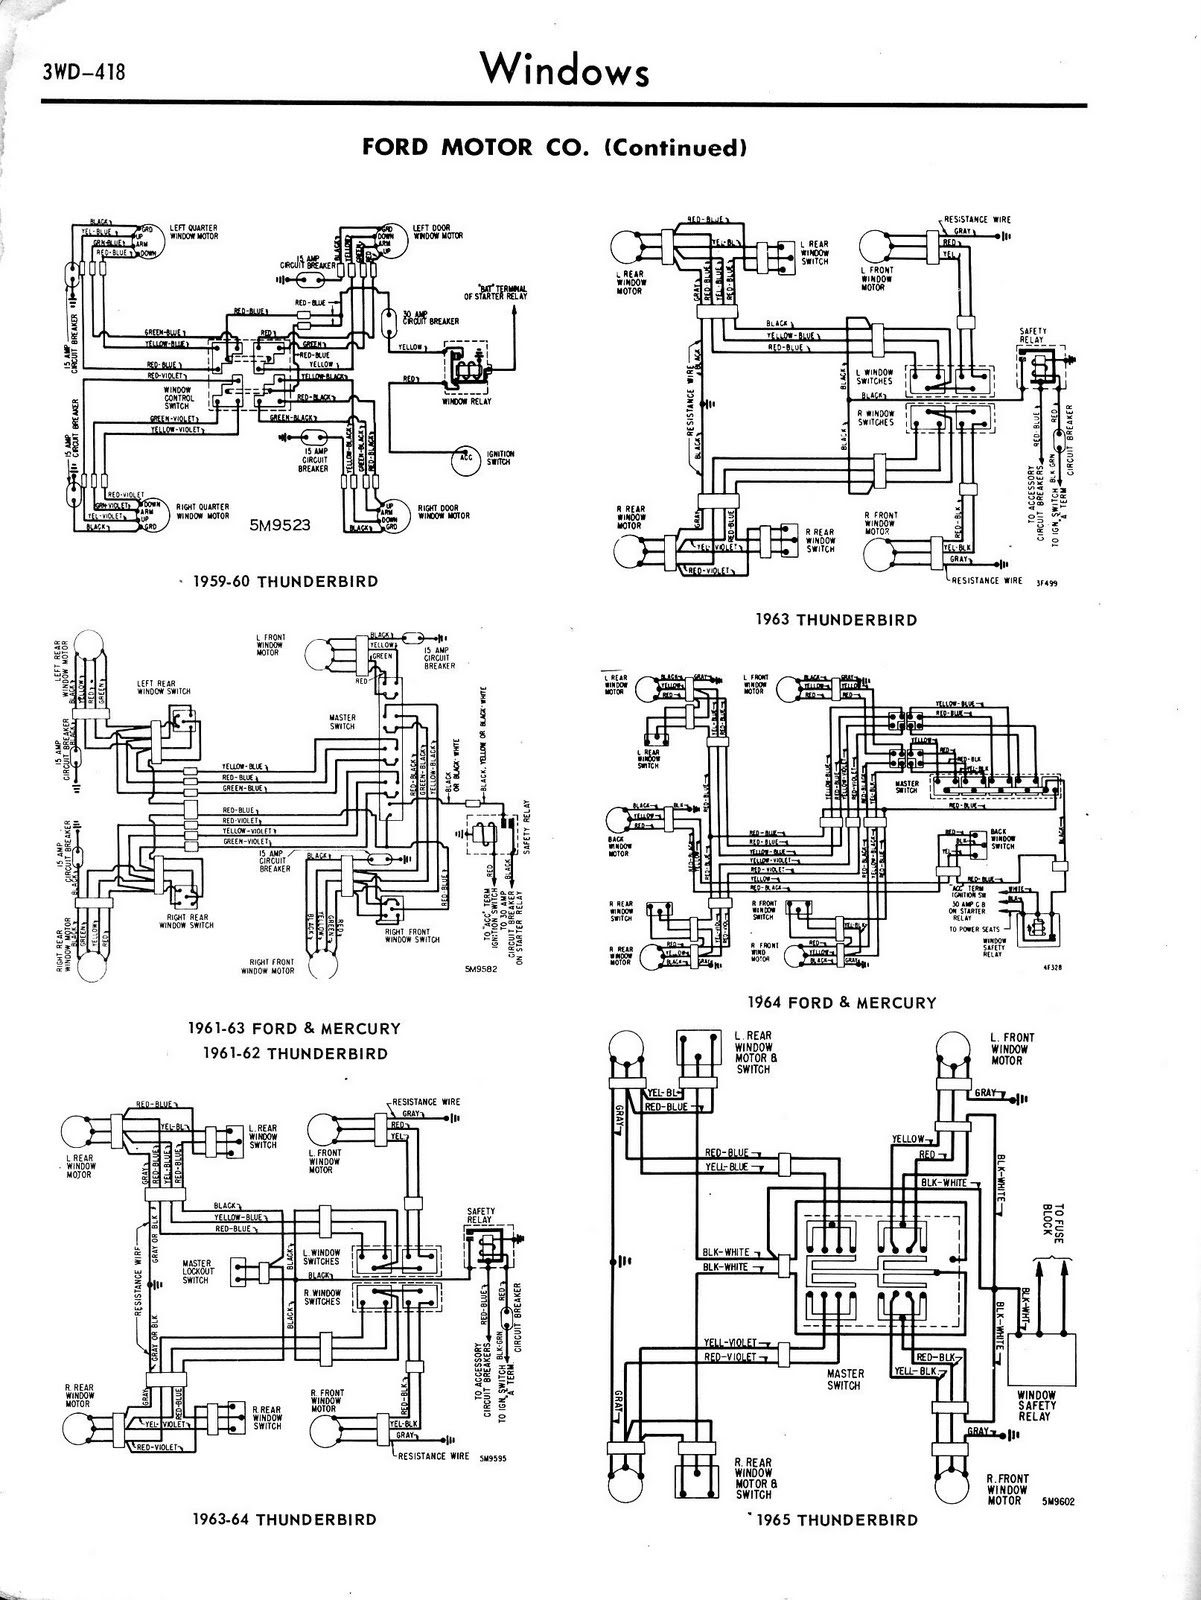 1968 triumph spitfire wiring diagram wiring library1968 triumph spitfire wiring diagram [ 1201 x 1600 Pixel ]